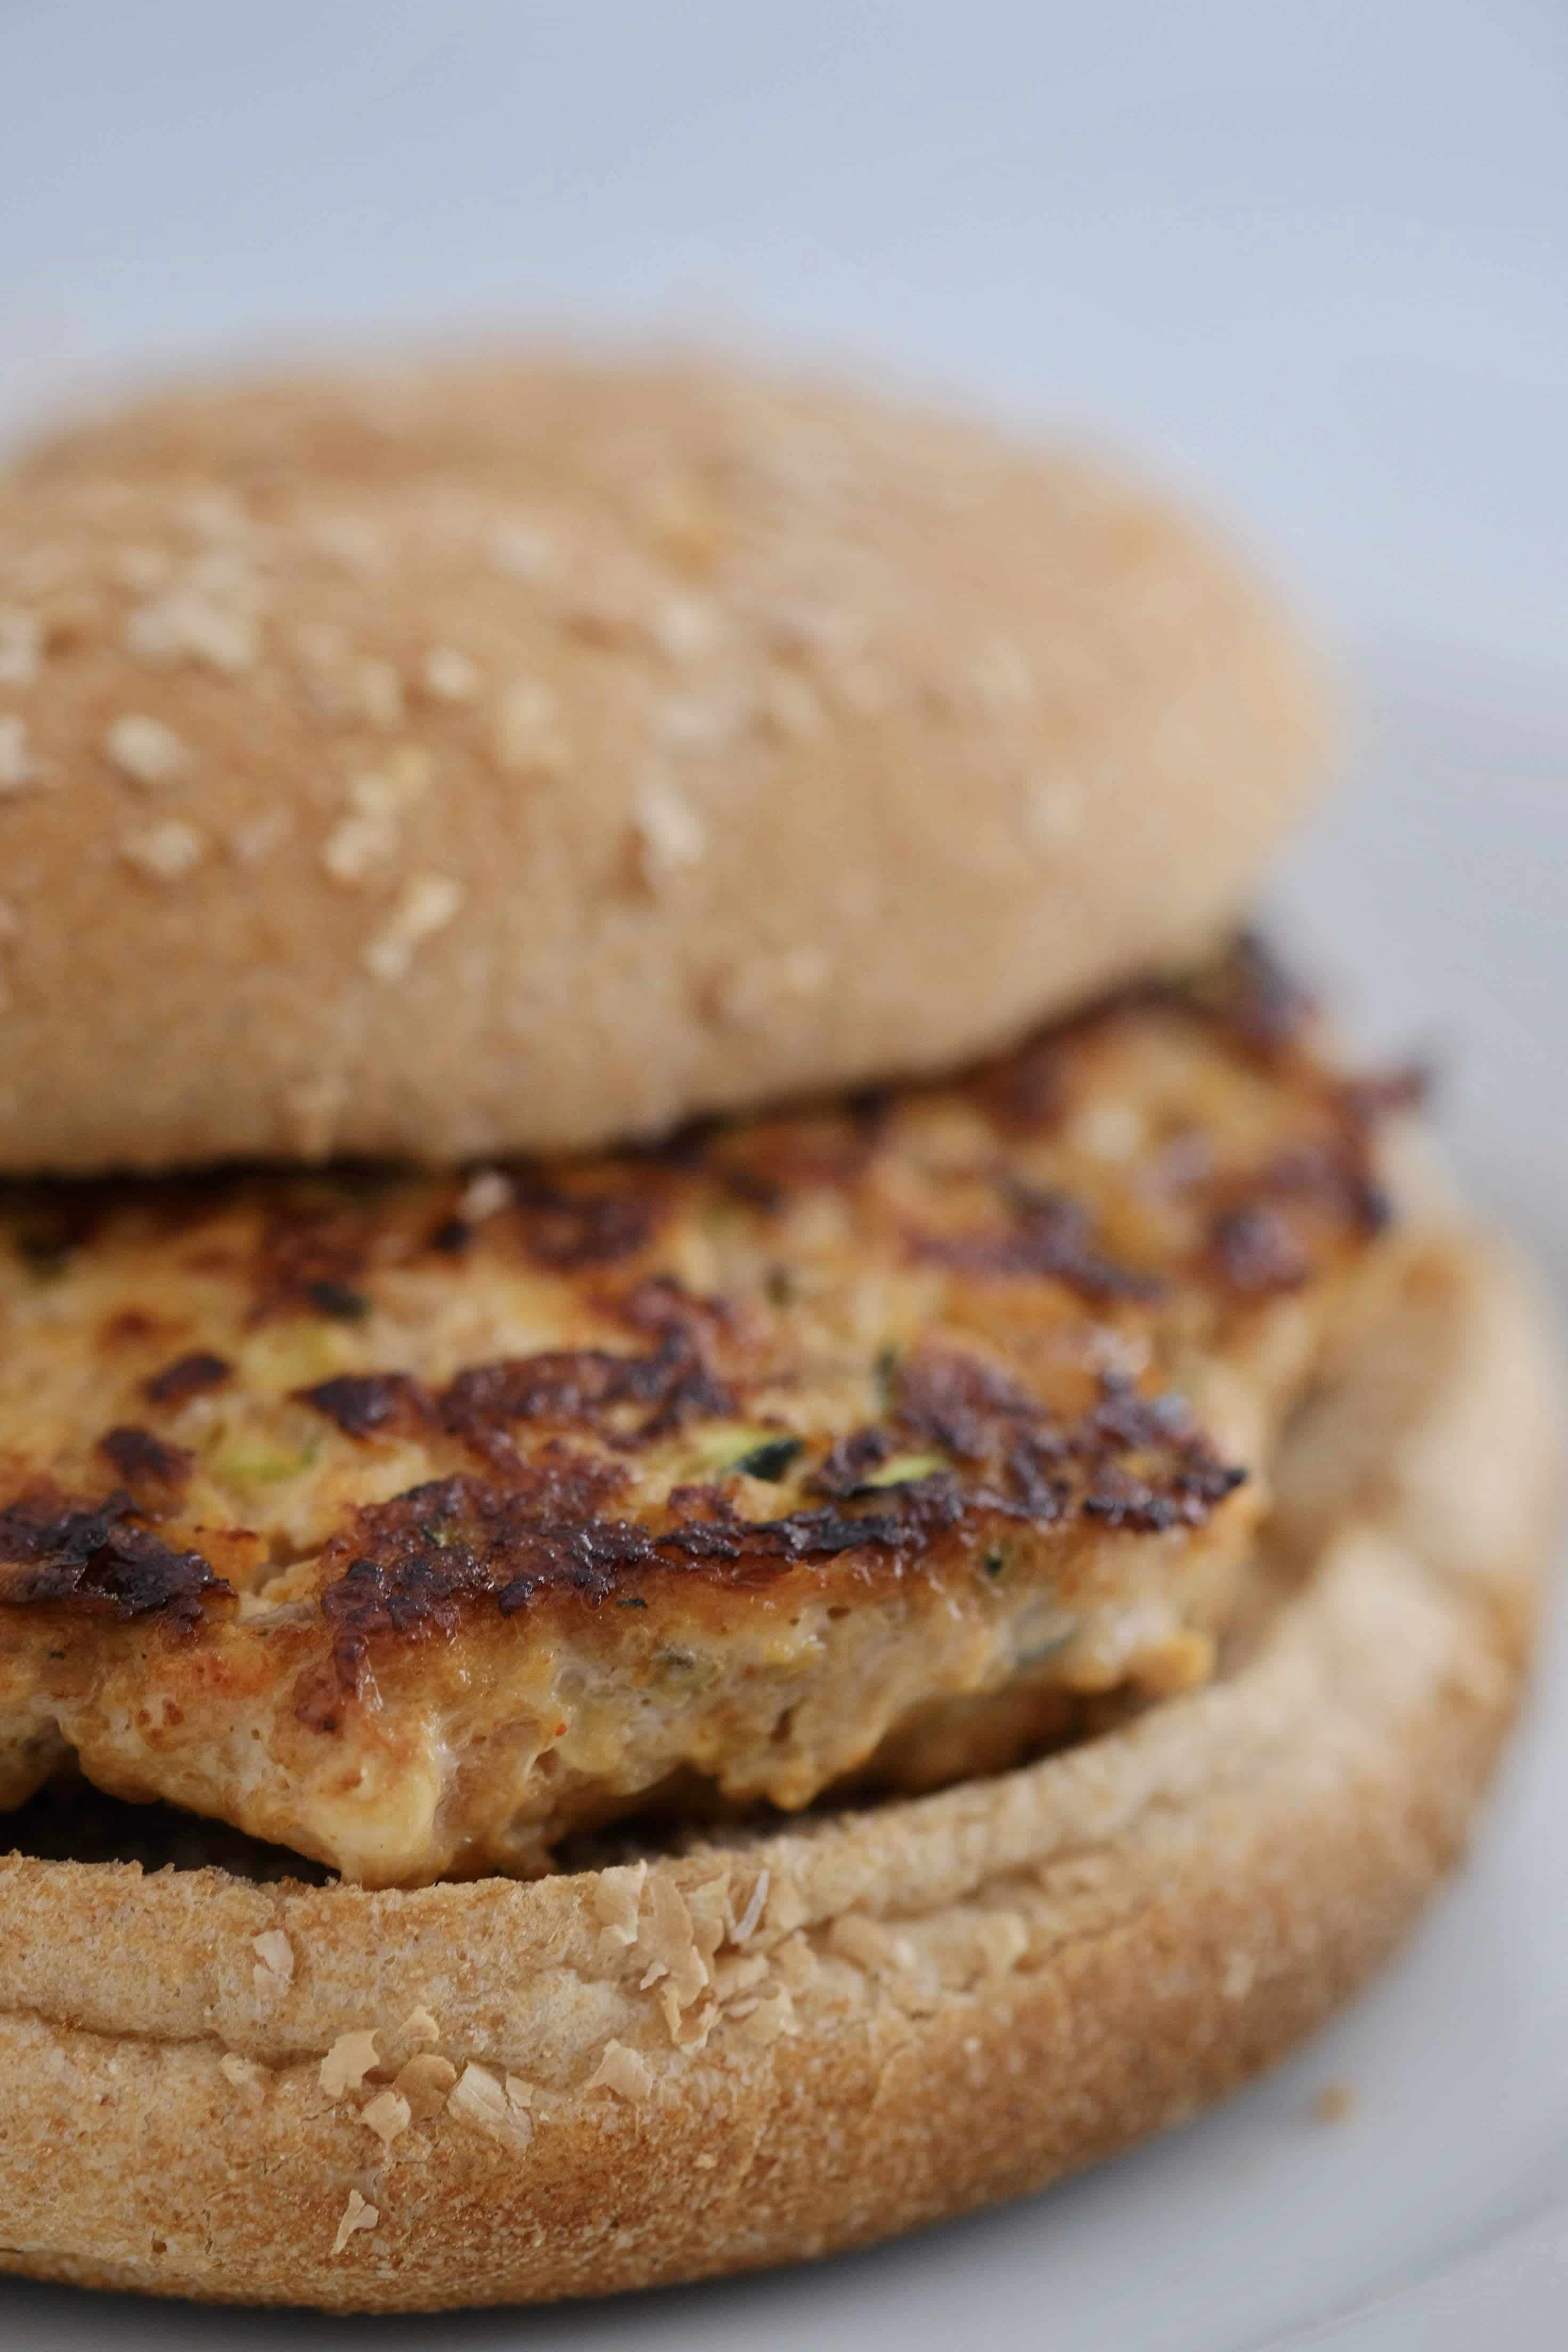 Turkey vegetable burger on a wheat bun sitting on a white plate